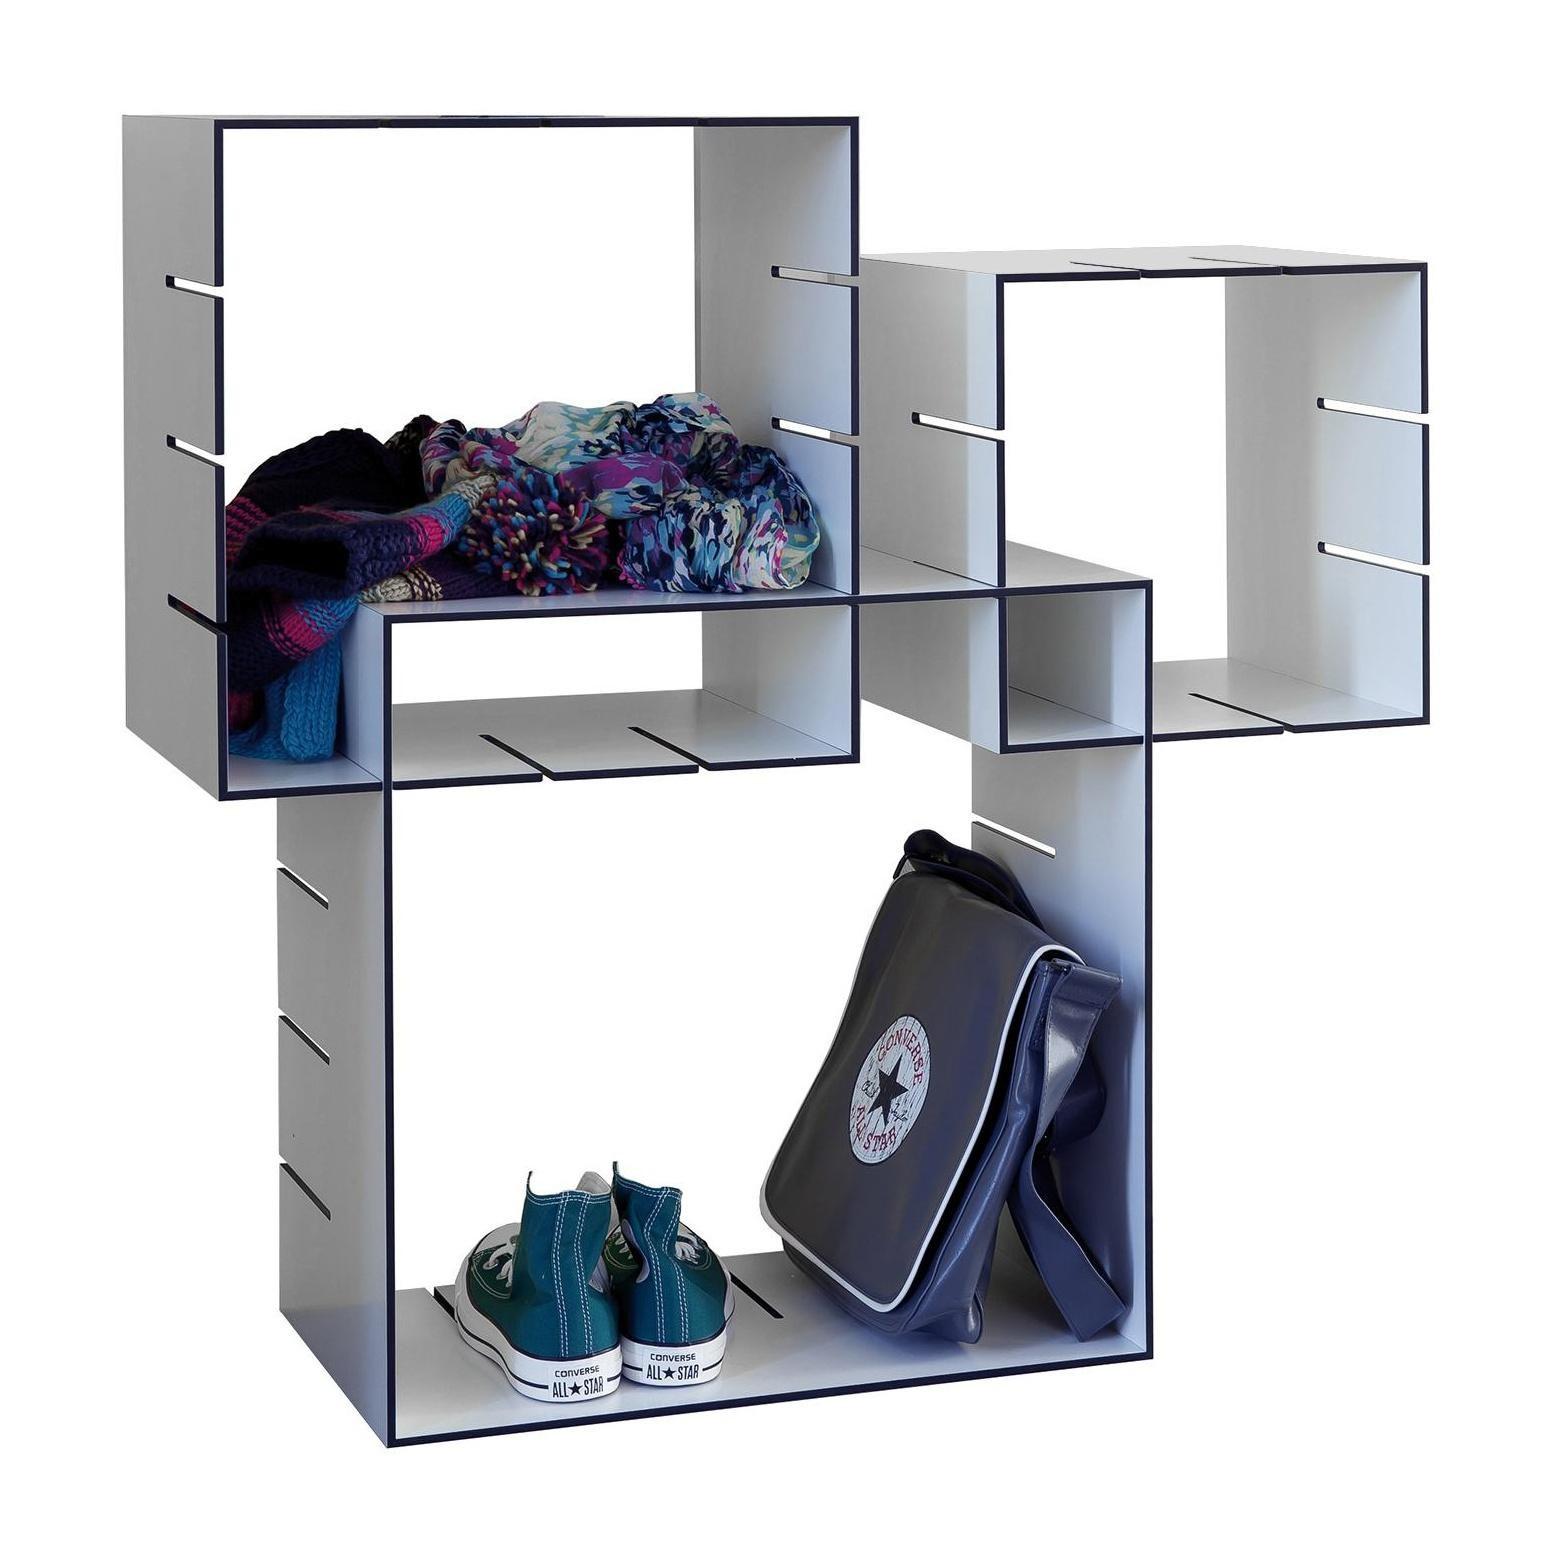 Super müller möbelwerkstätten Konnex Wall Shelf | AmbienteDirect FQ-07